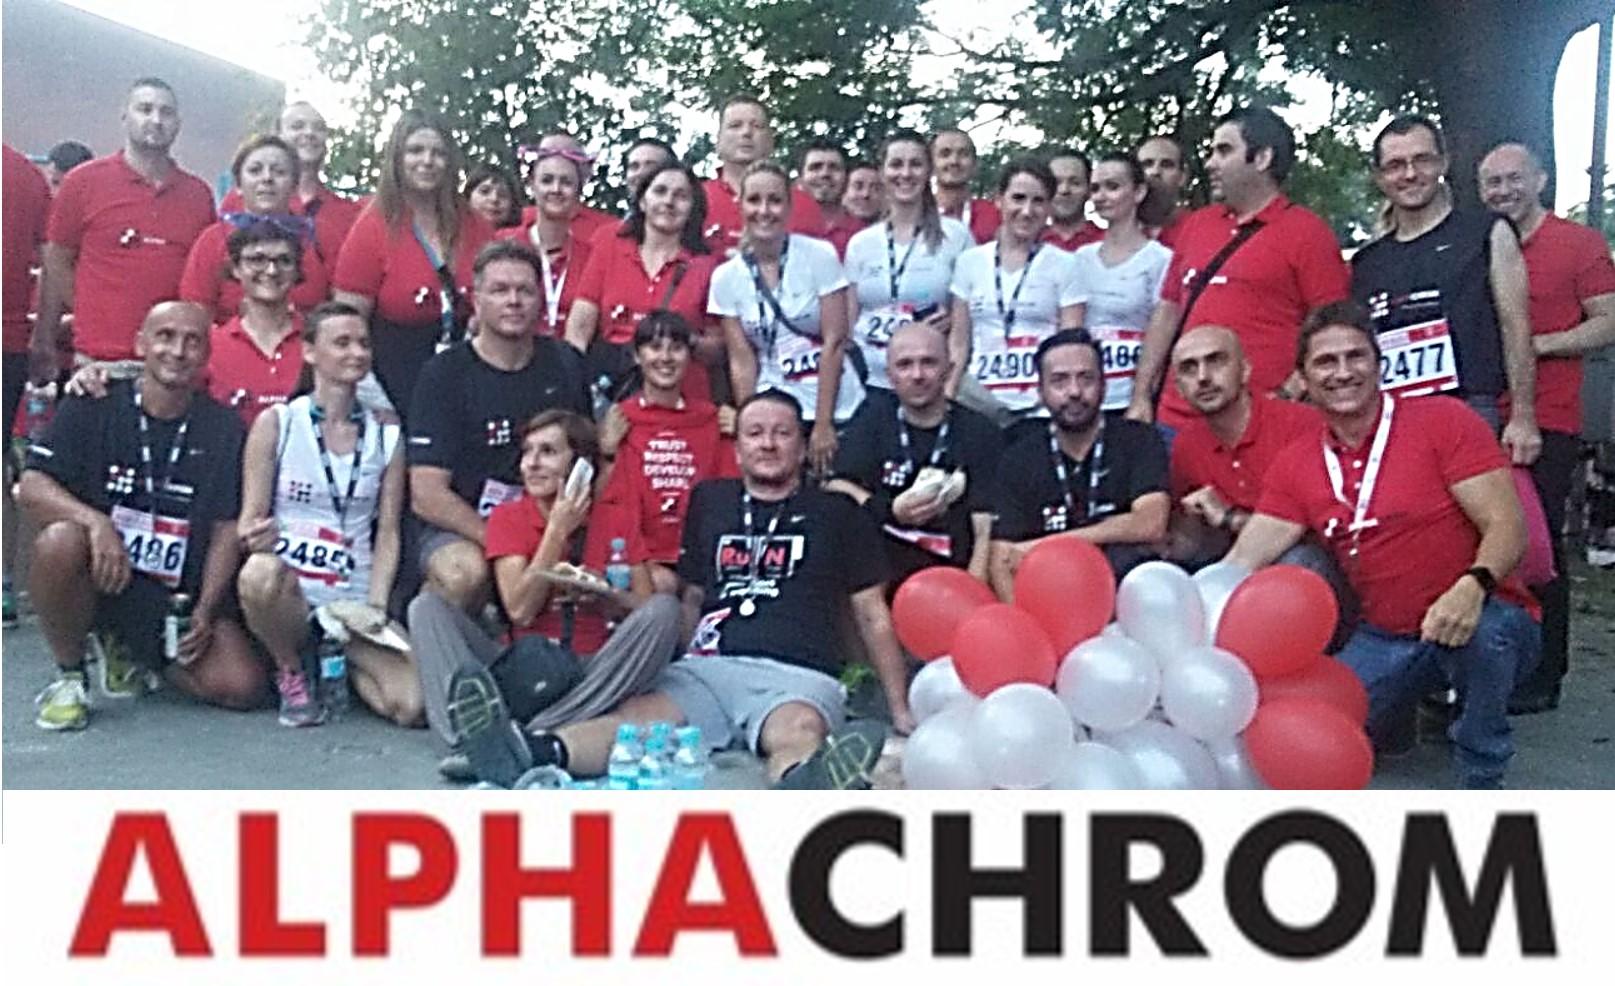 alphachrom